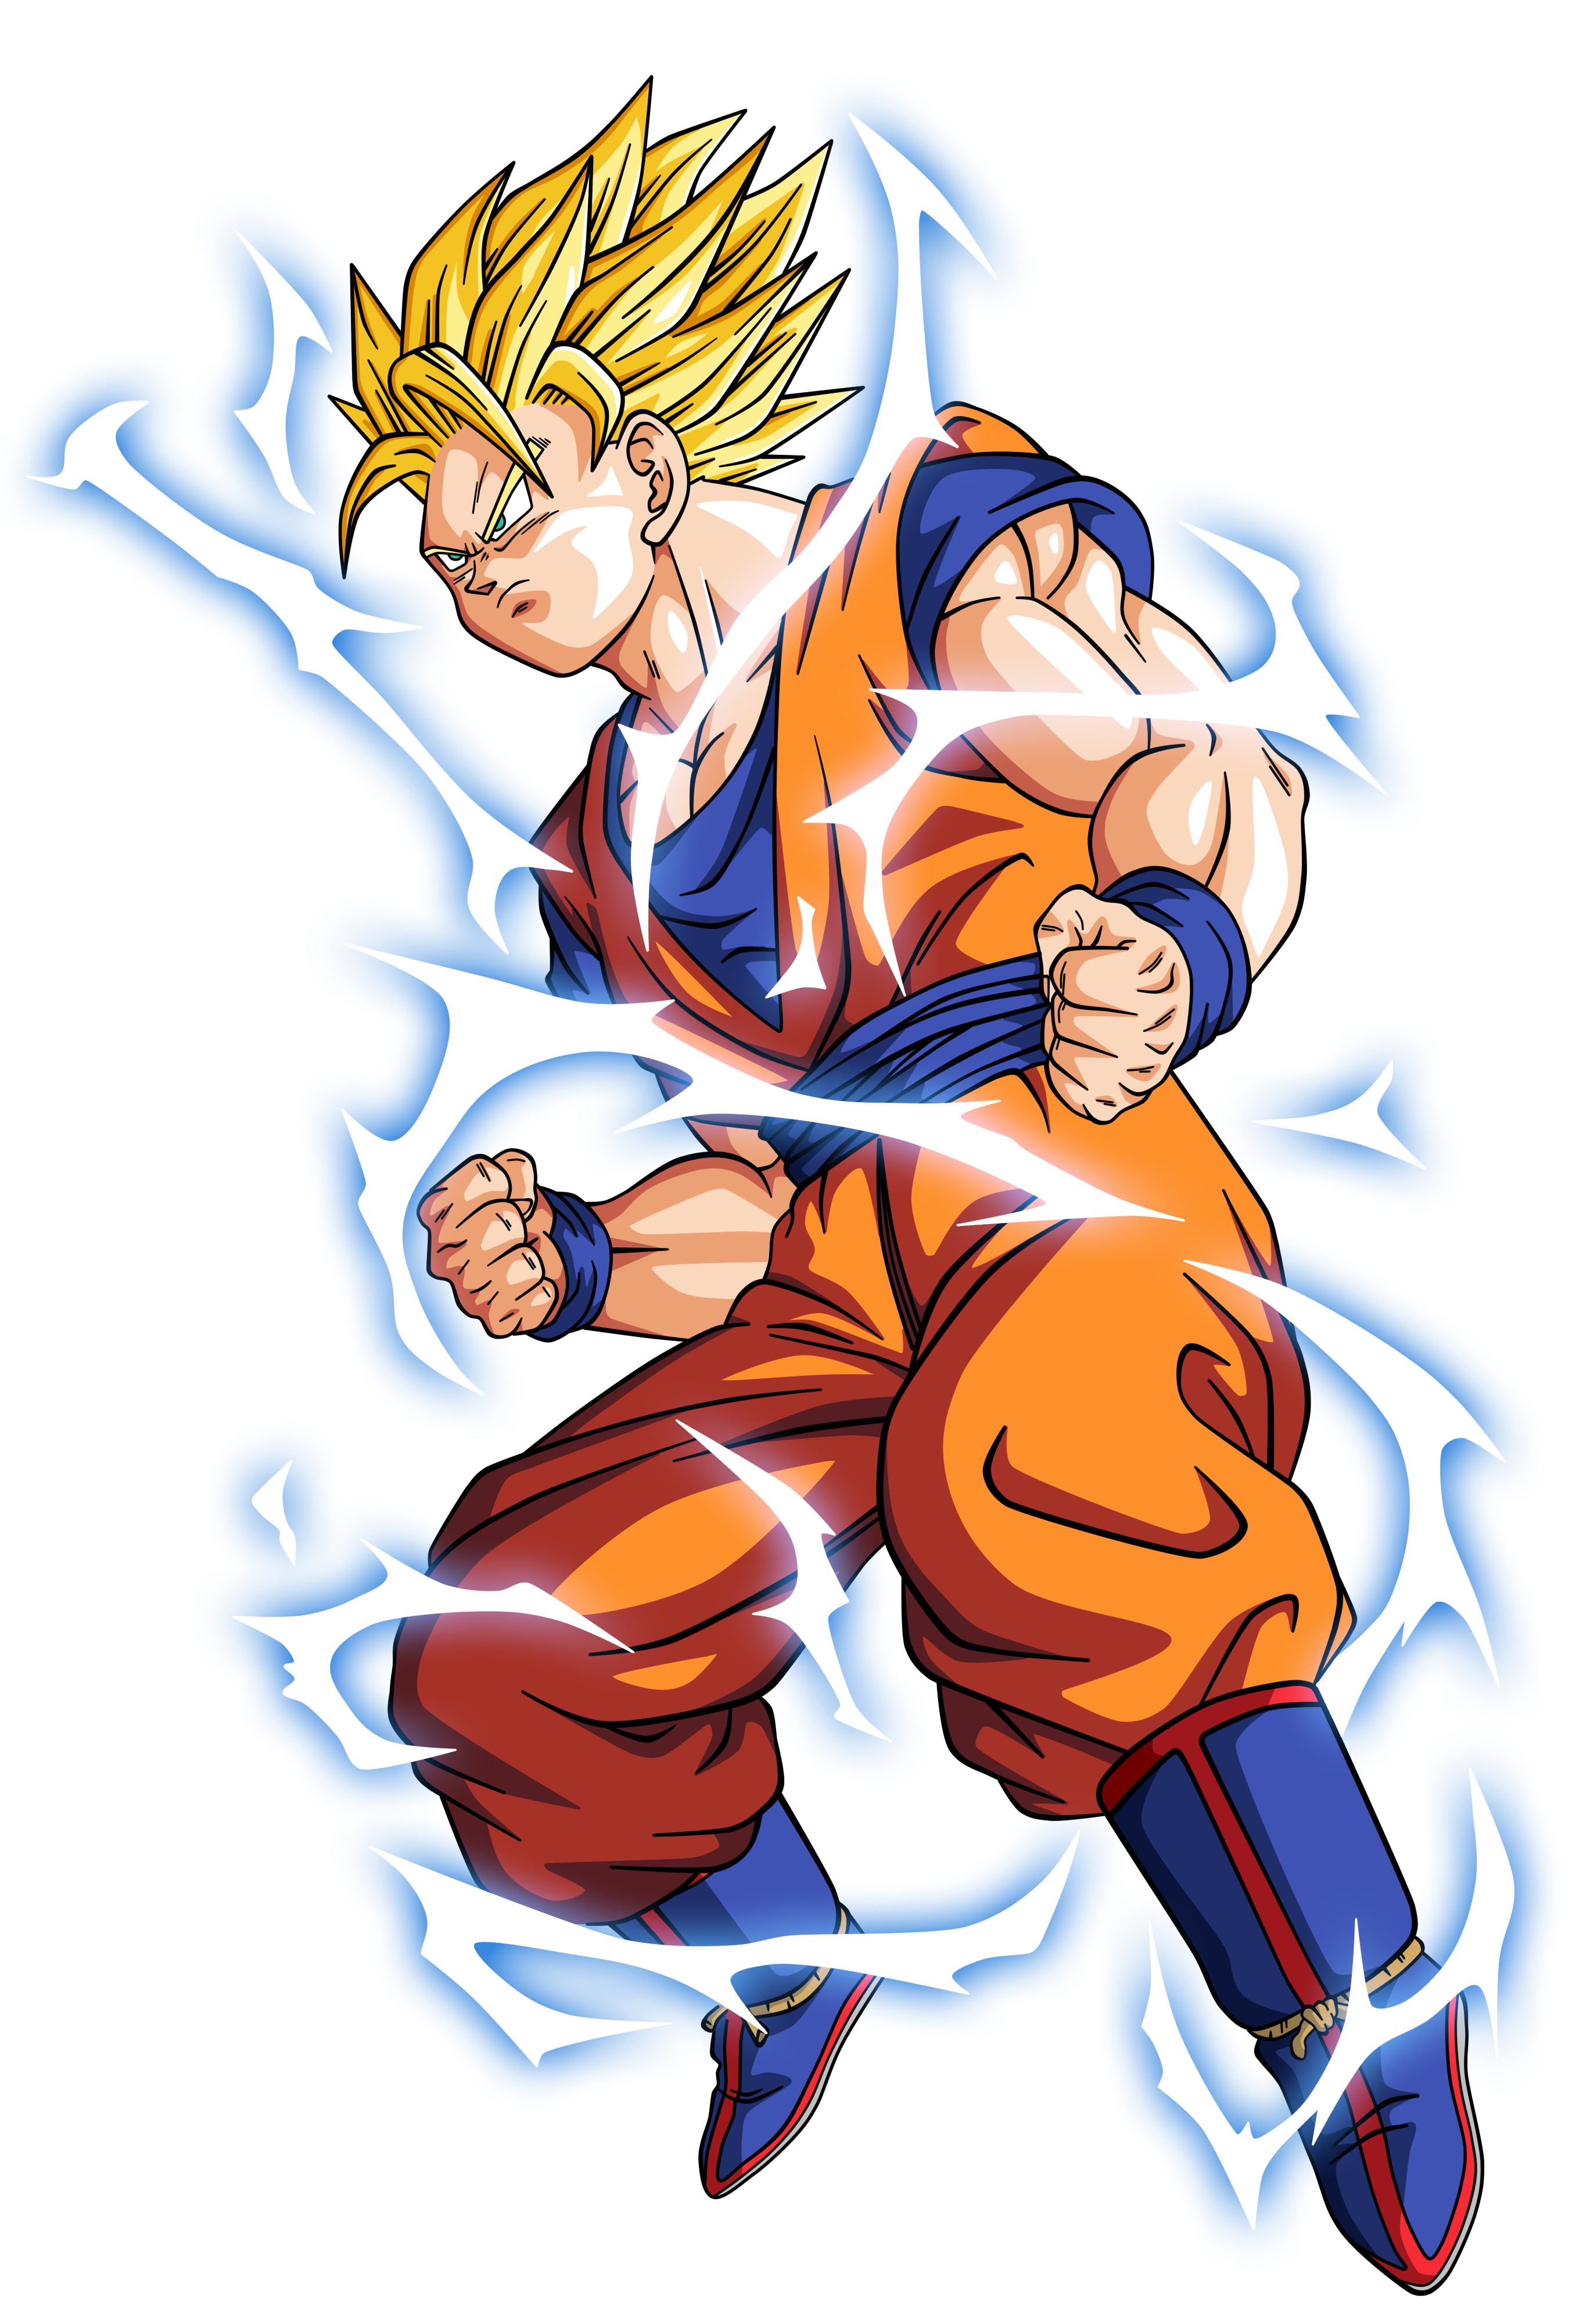 Goku Super Saiyan 2 By Bardocksonic On Deviantart